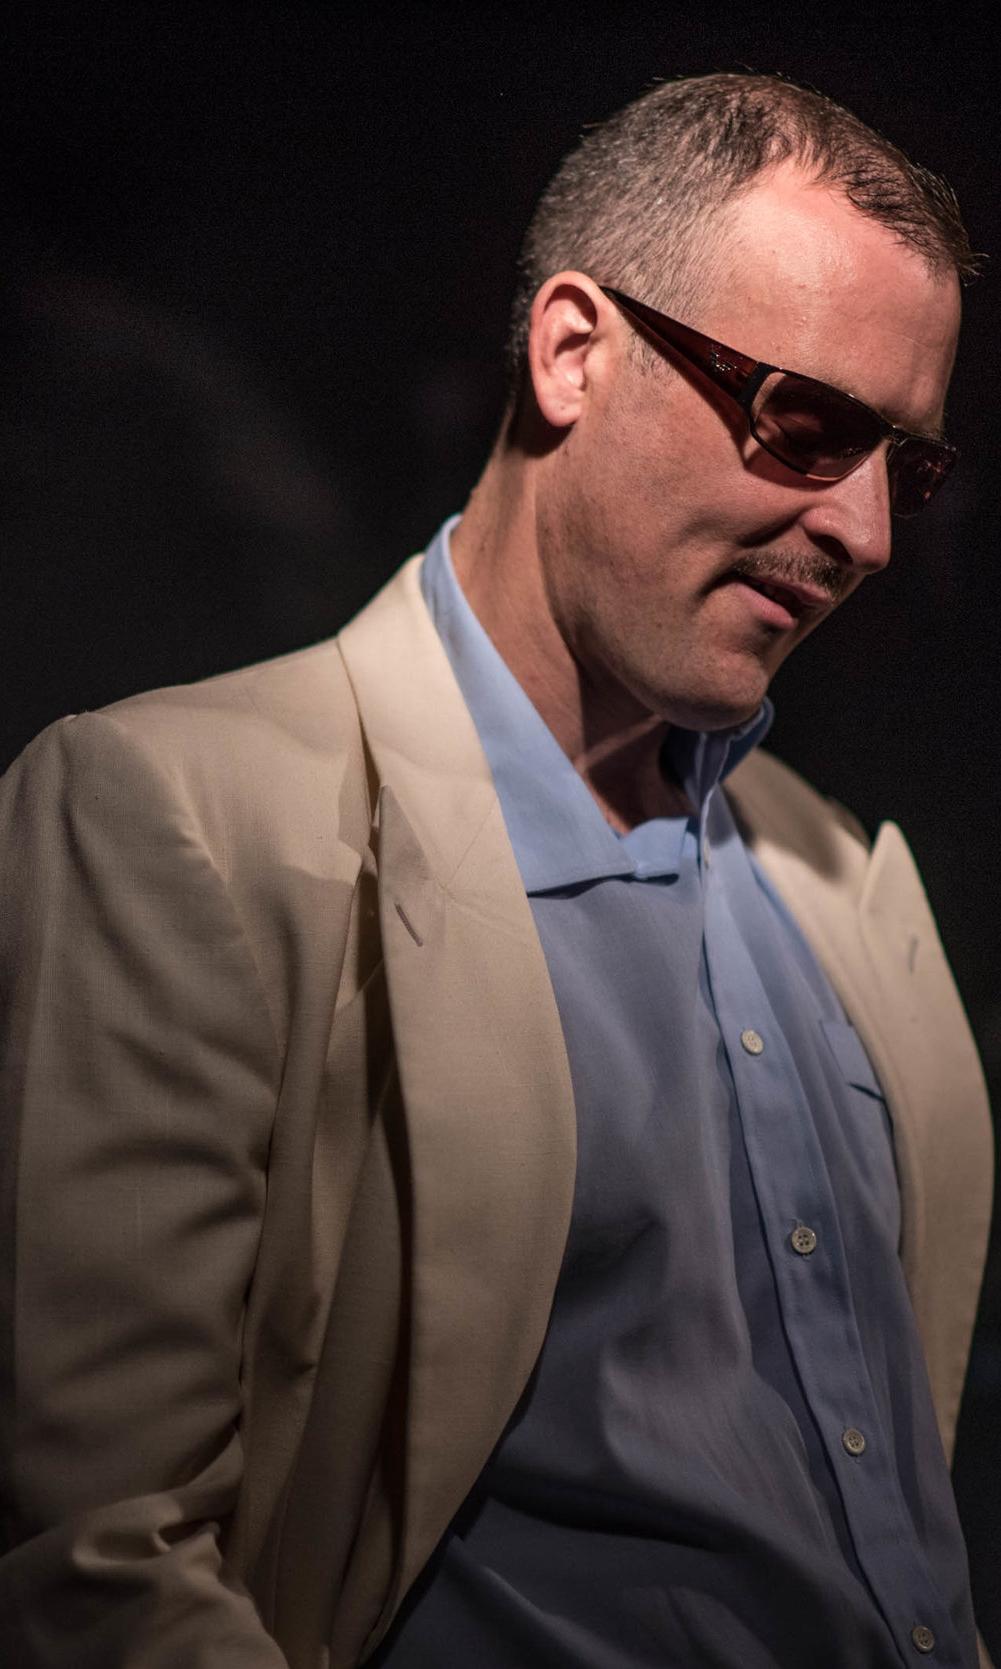 Graham Cutherbertson as Jay. Photo by Dahlia Katz